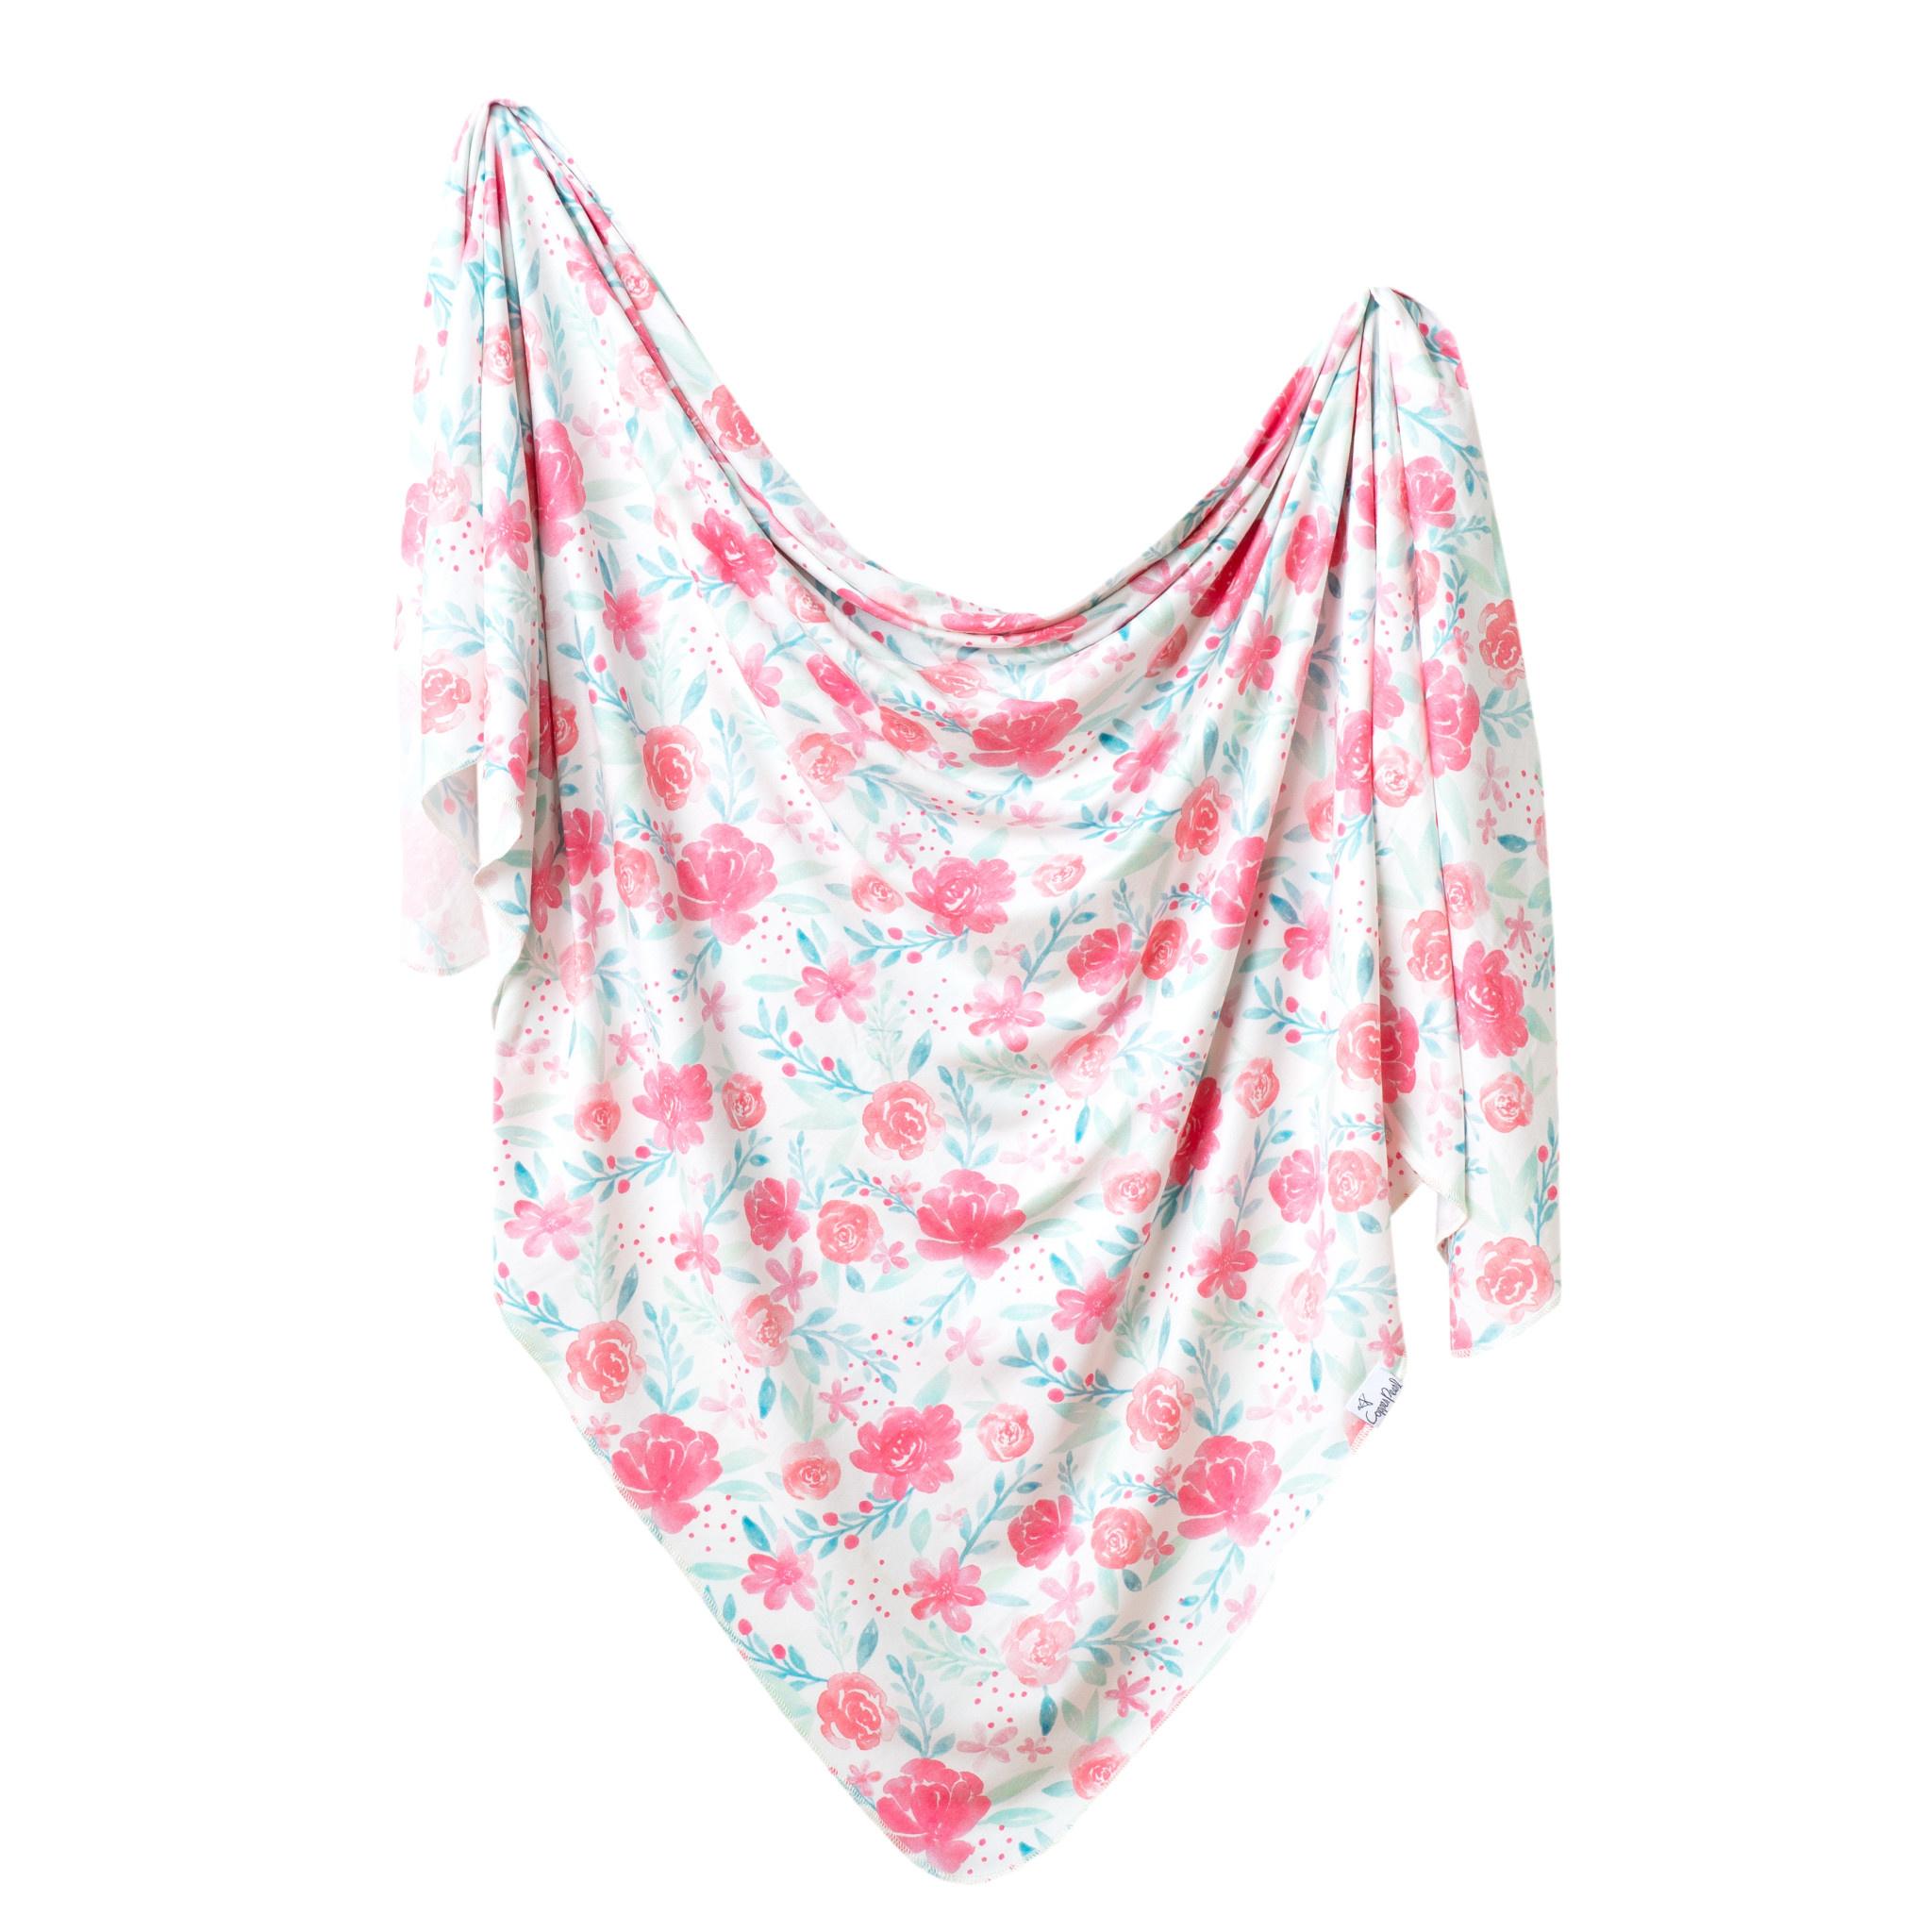 Copper Pearl Knit Swaddle Blanket June